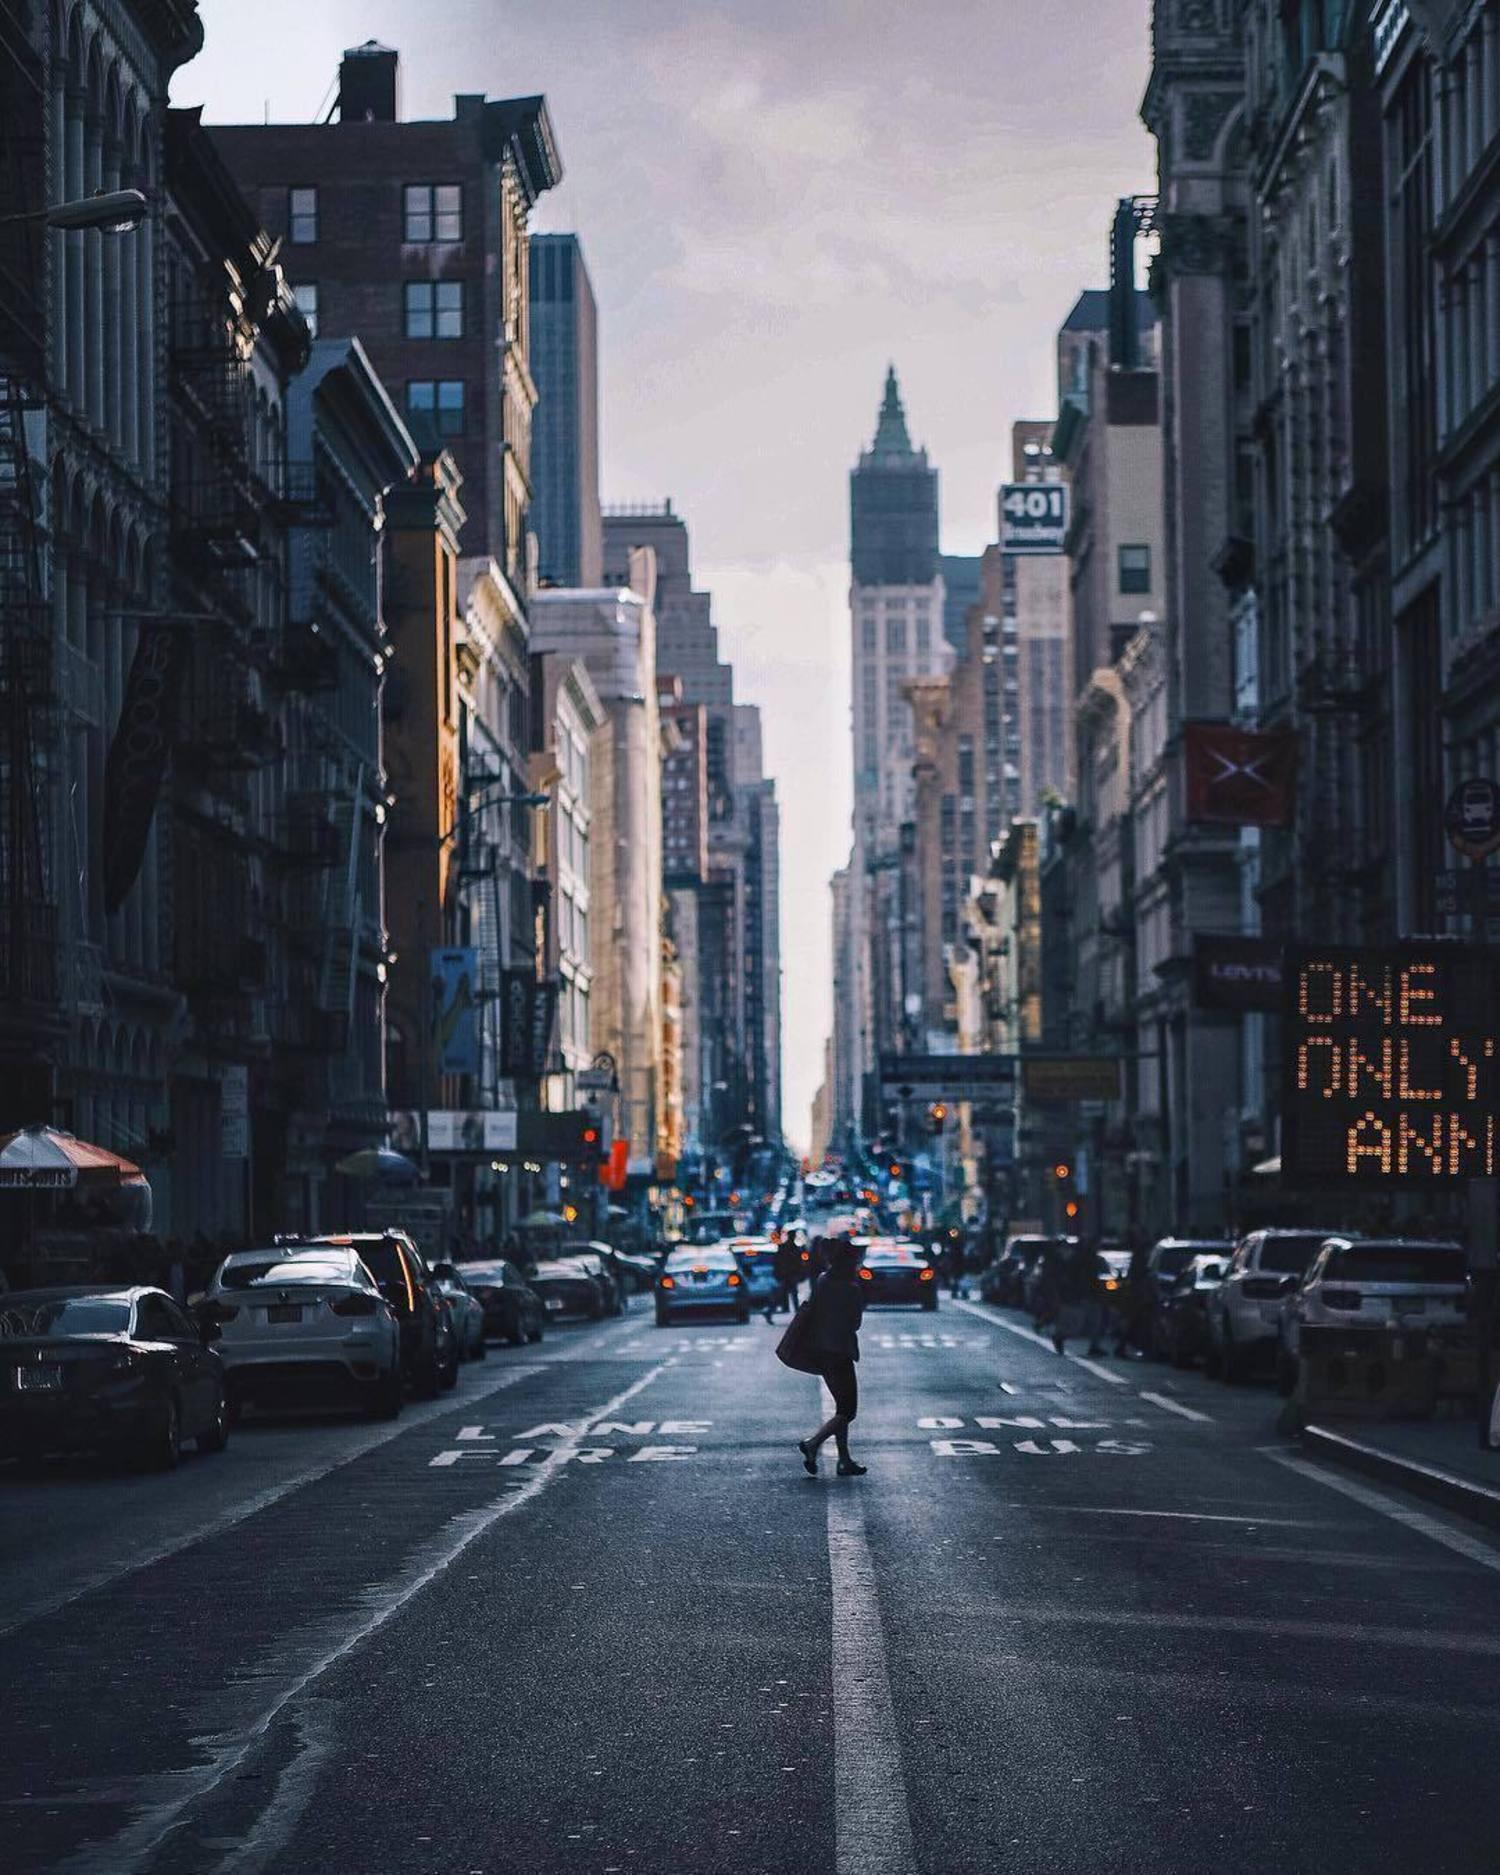 New York, New York. Photo via @golden2dew #viewingnyc #newyork #newyorkcity #nyc